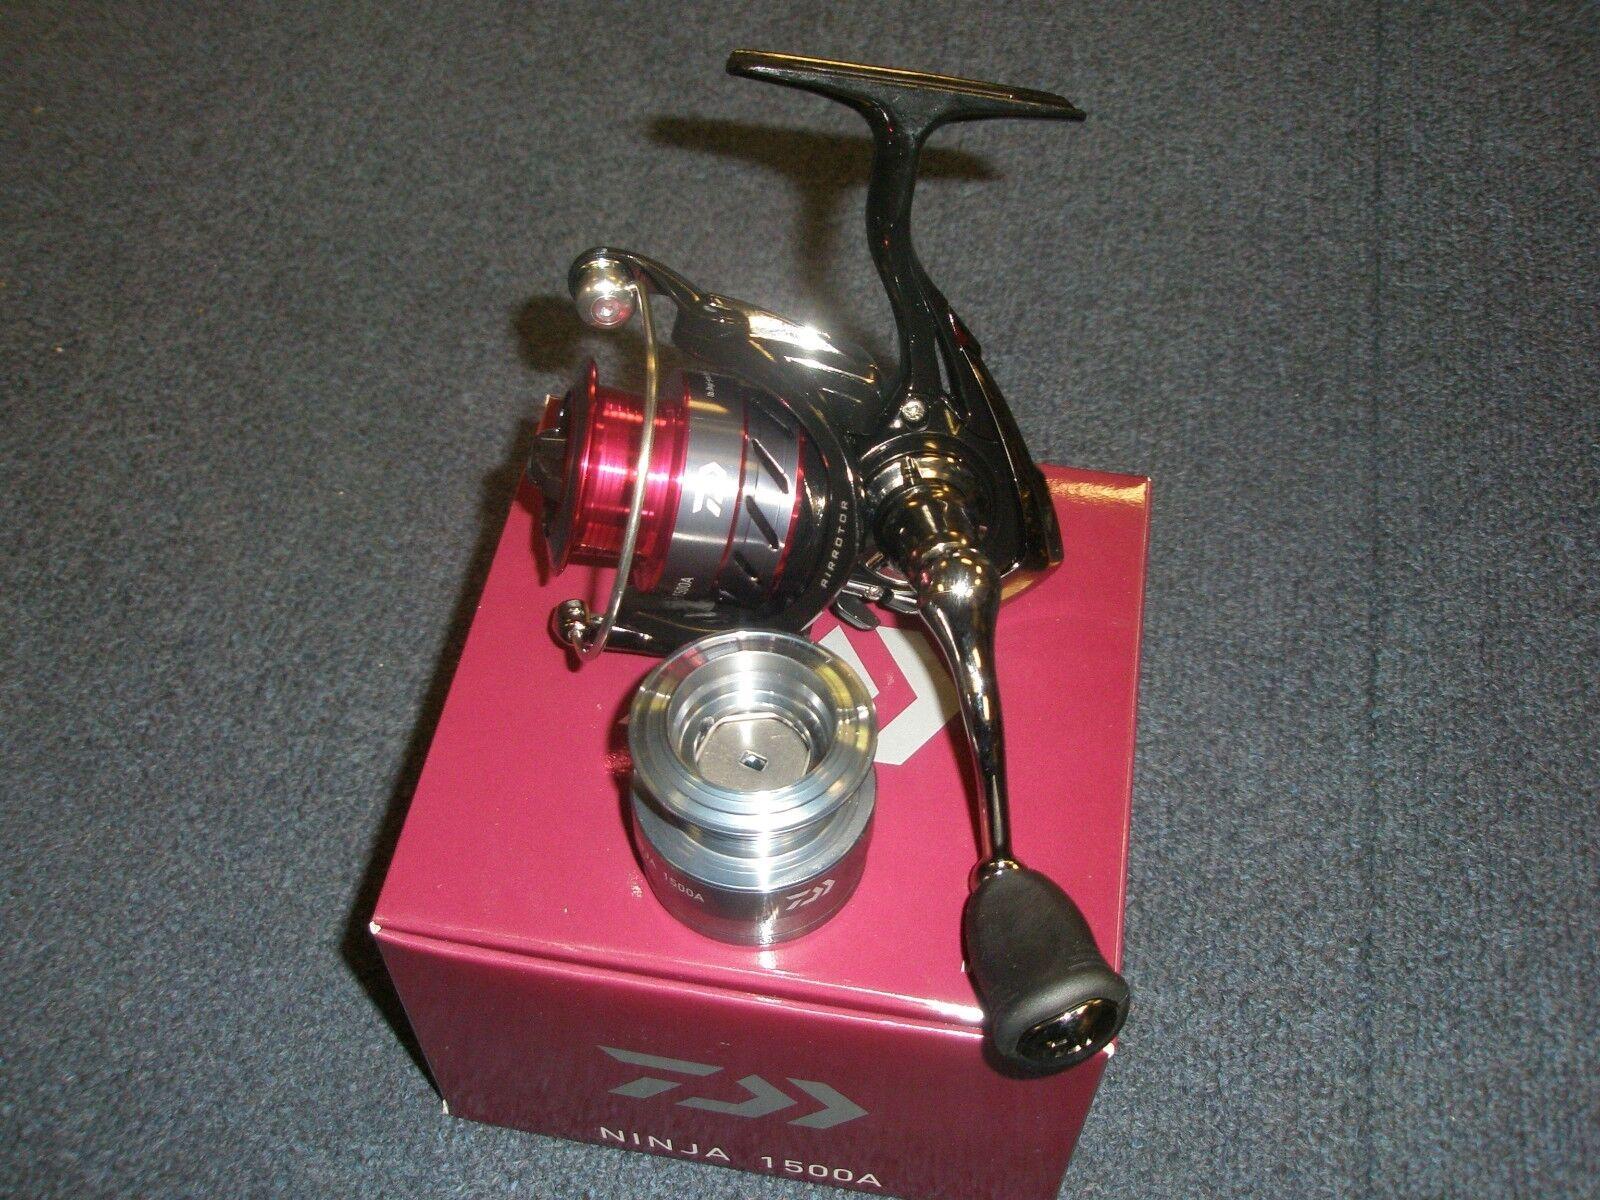 Daiwa Ninja 1500A Front Drag Fishing Reel Reel Fishing + Spare Spool e6c80c